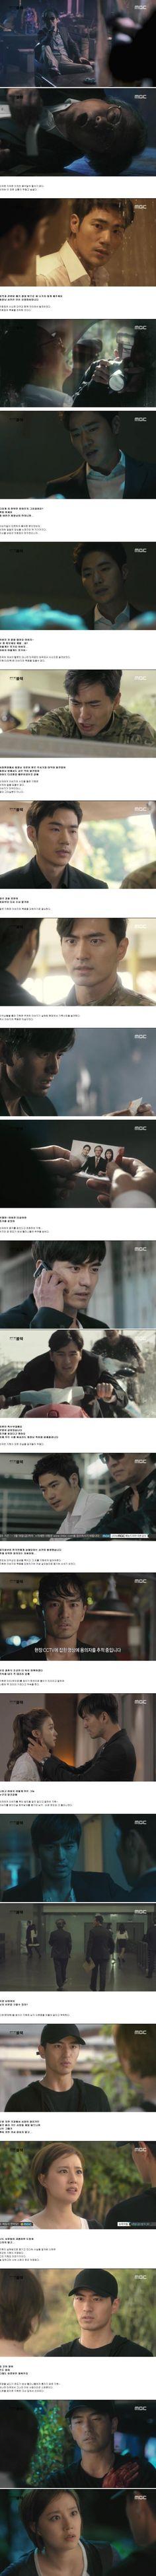 [Spoiler] Added episode 2 captures for the Korean drama 'Goodbye Mr. Black' @ HanCinema :: The Korean Movie and Drama Database